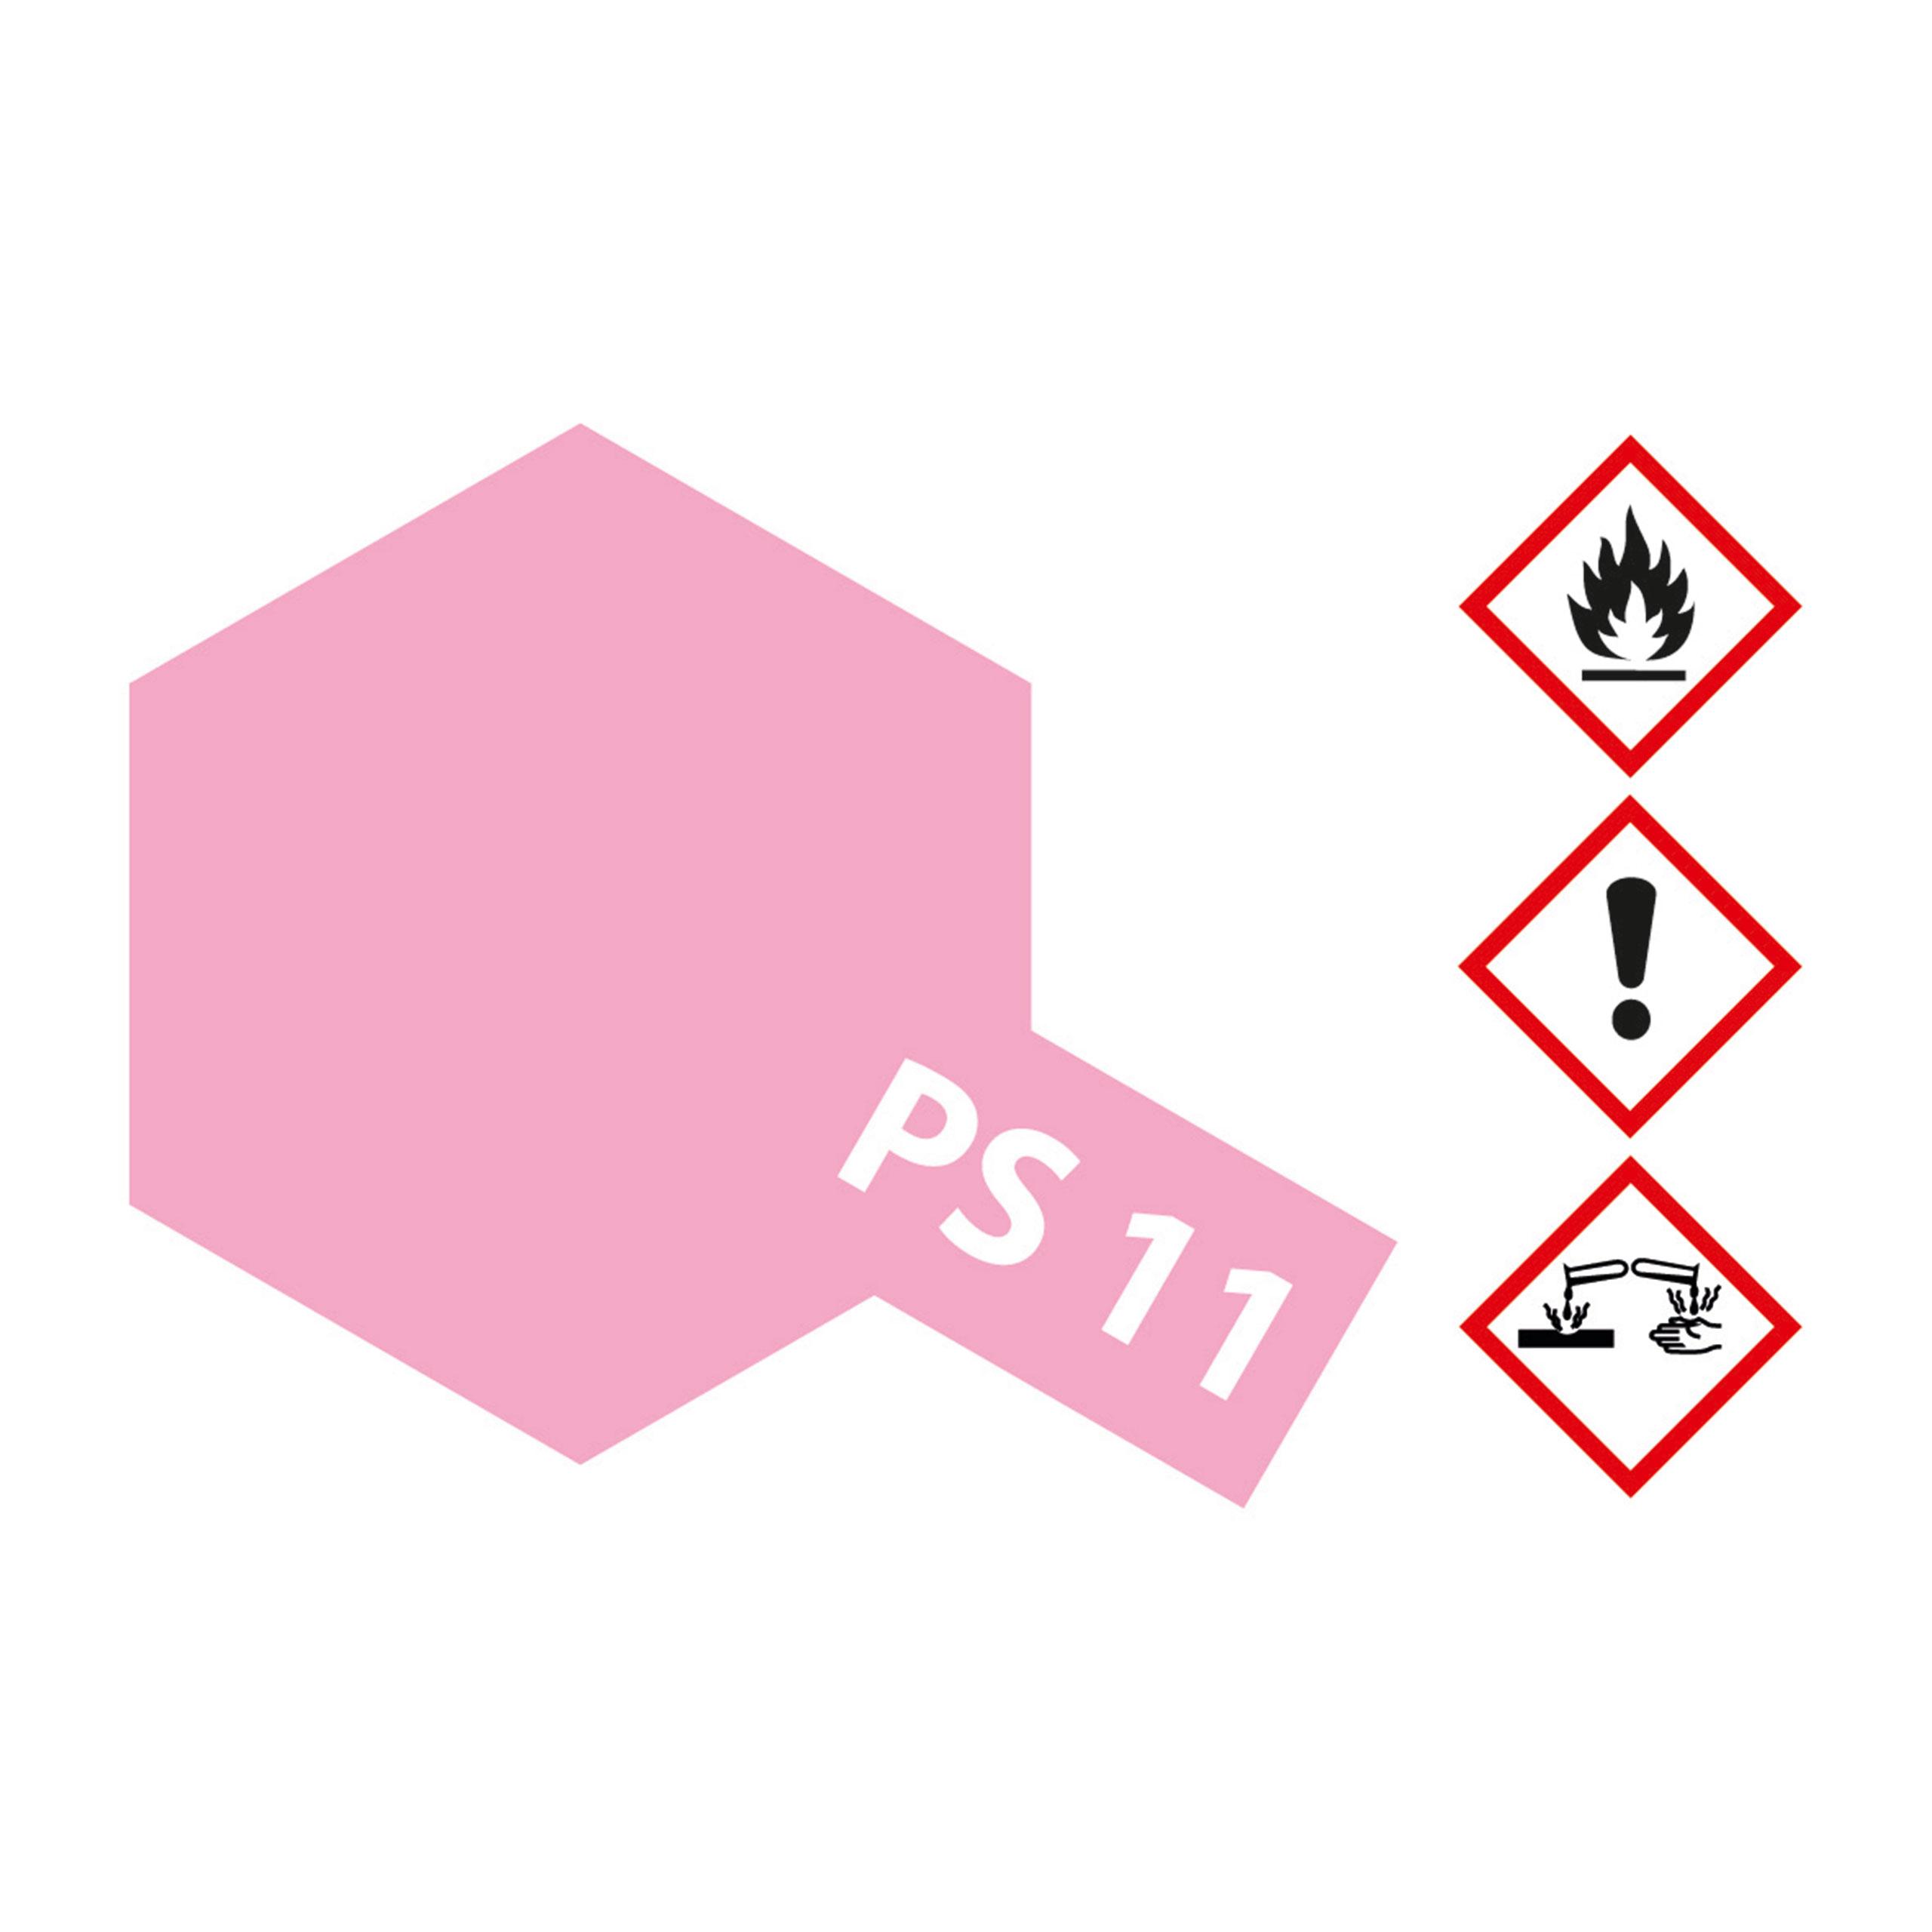 PS-11 Rosarot Polycarbonat - 100ml Sprayfarbe Lexan - Tamiya 300086011